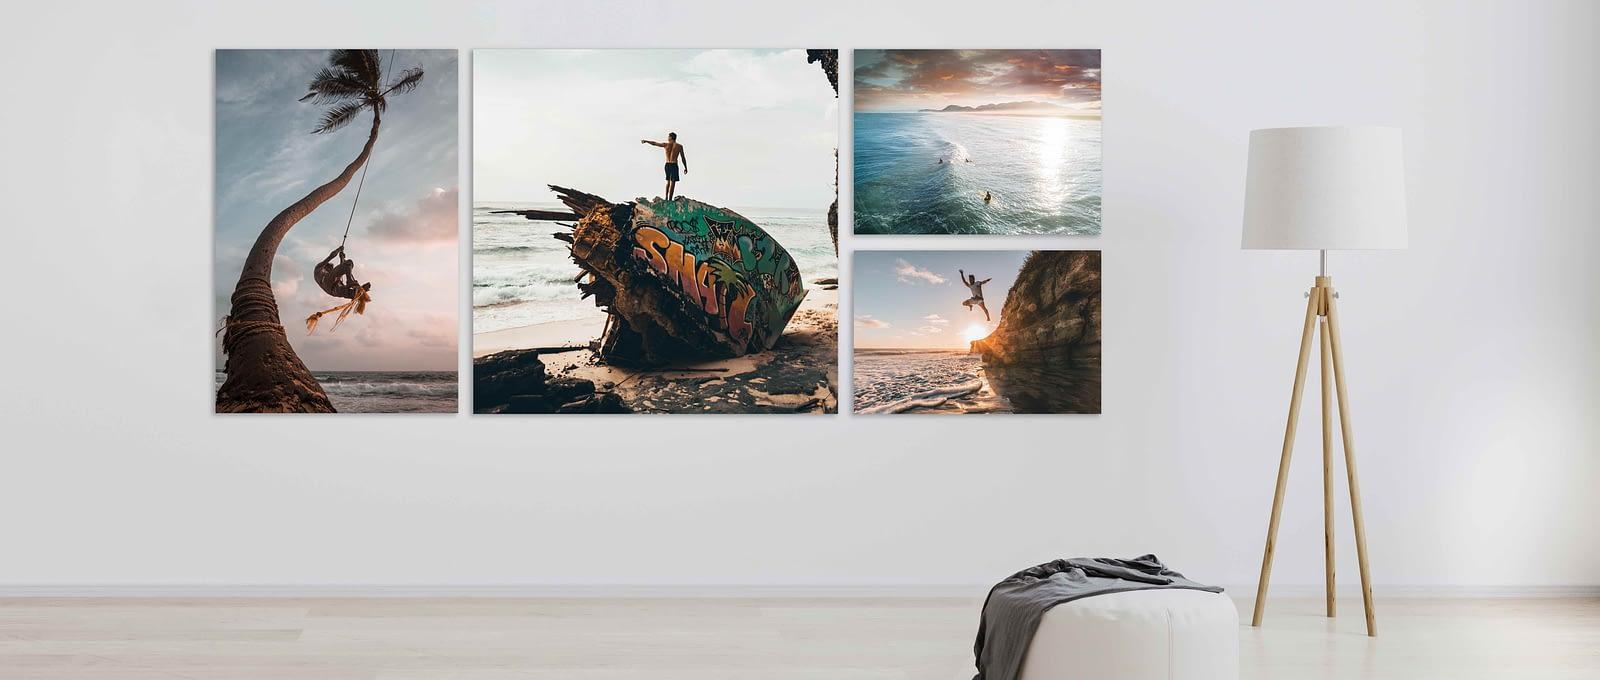 Xpozer-collage grid